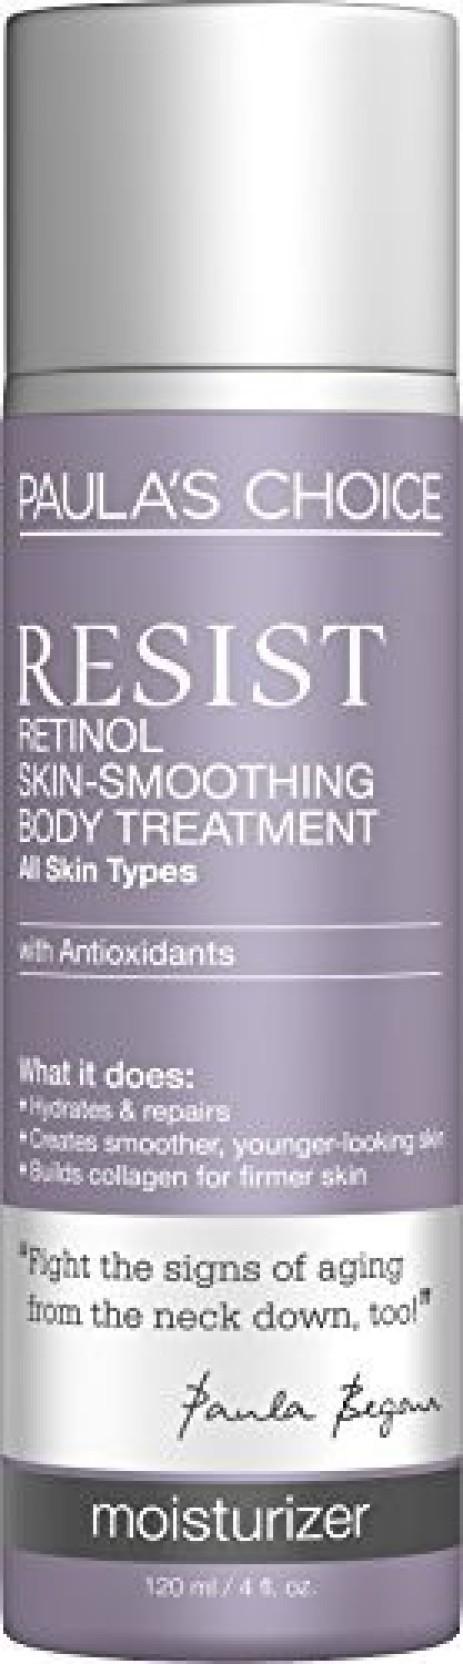 Paula's Choice resist retinol skin-smoothing body lotion treatment